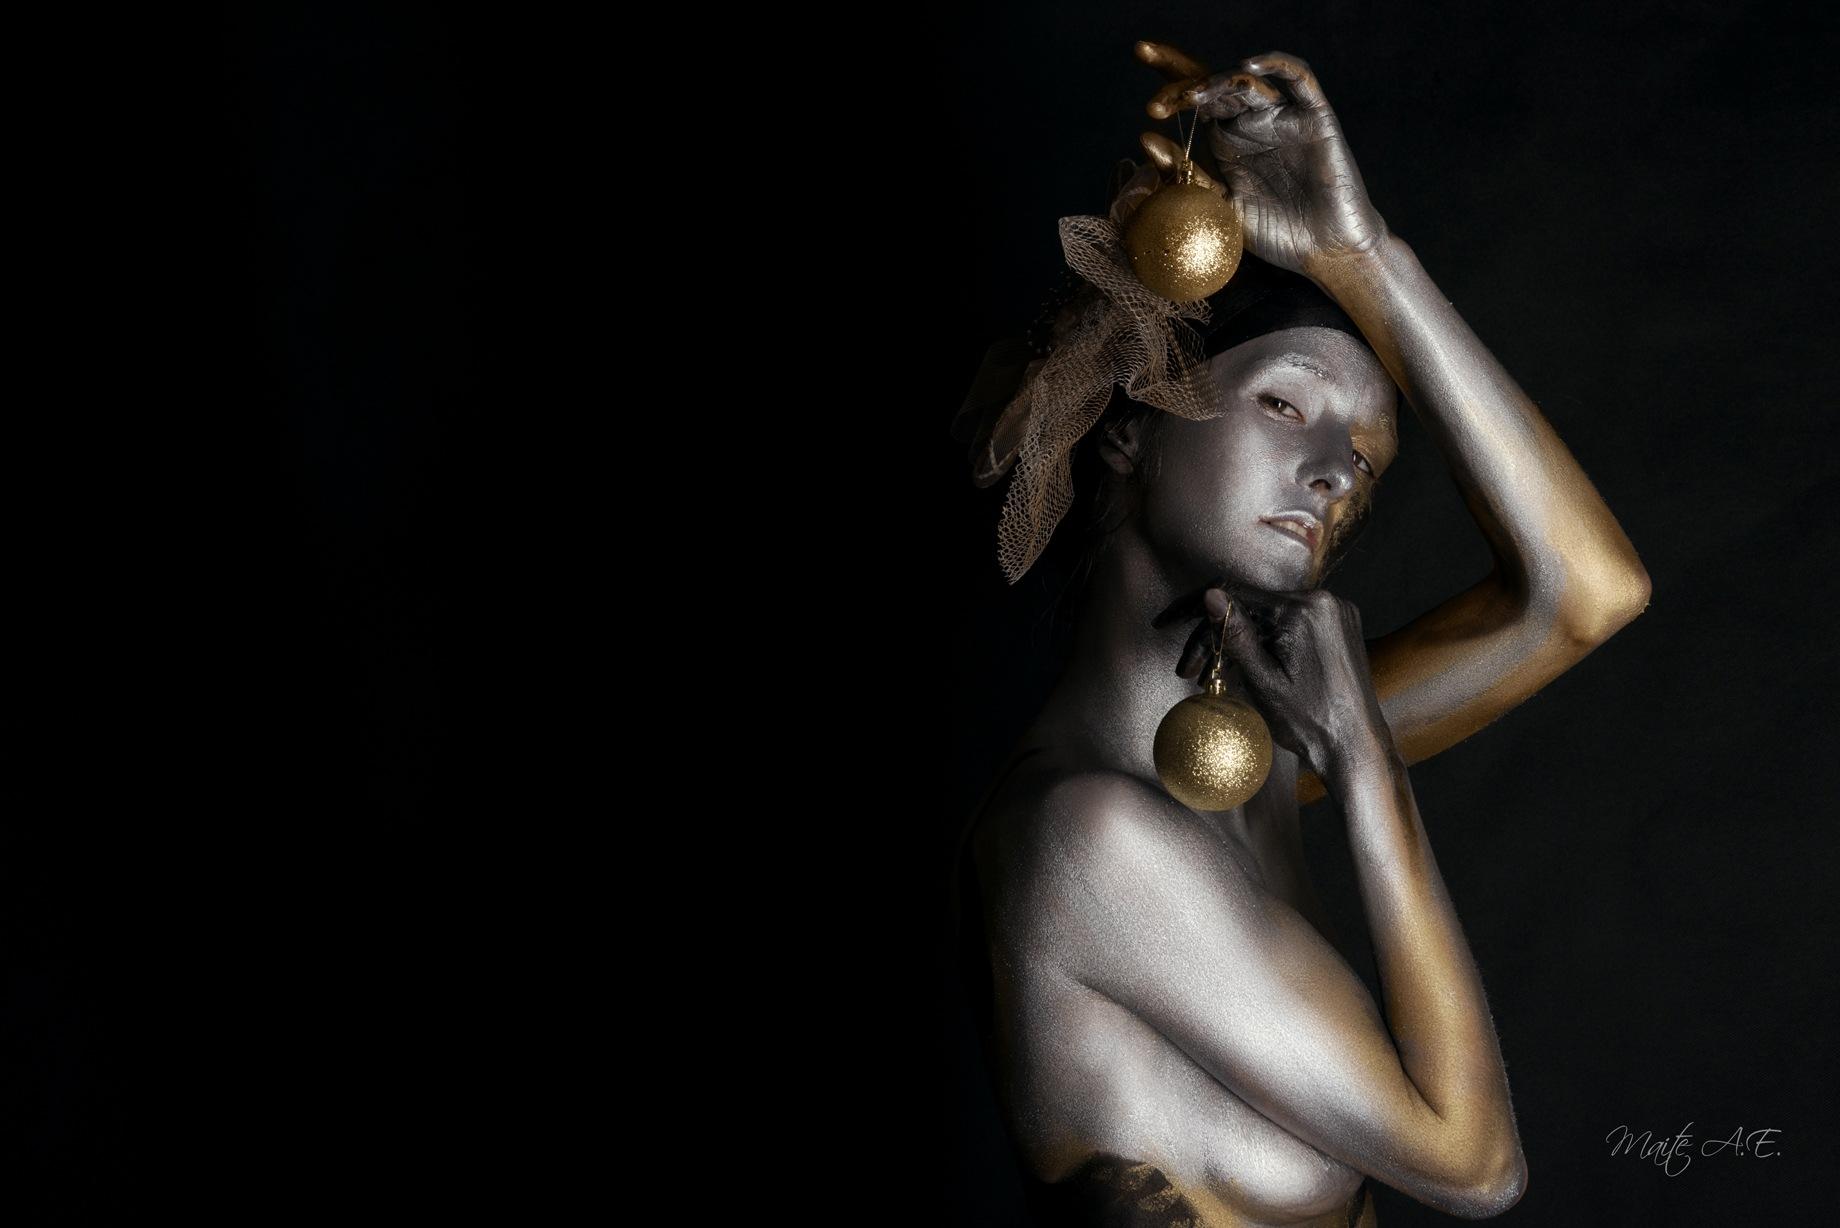 Metallic by Maite AE